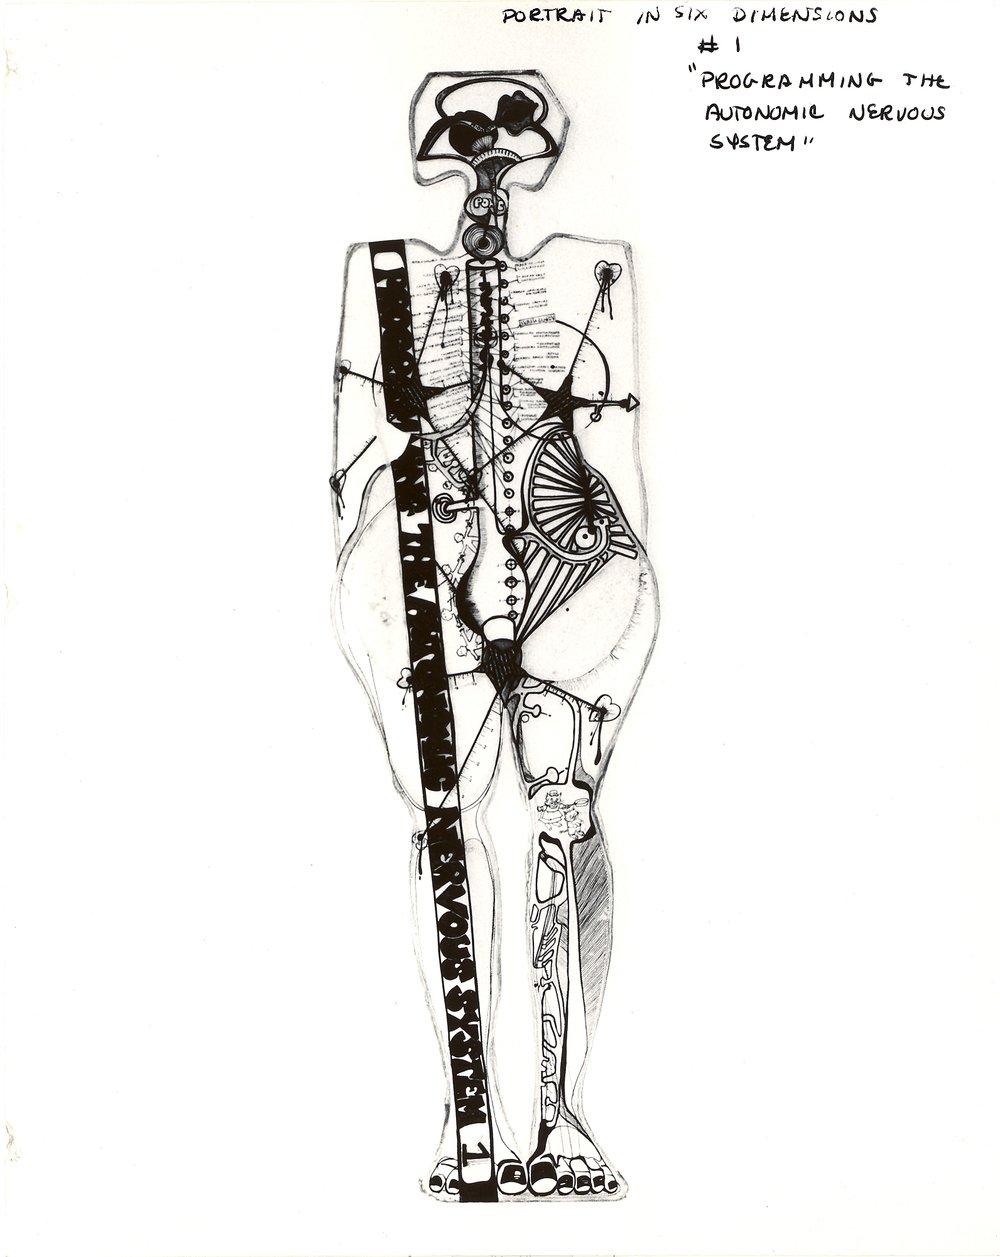 Portrait in Six Dimensions - Panel 1 - Programming the Autonomic Nervous System.jpg